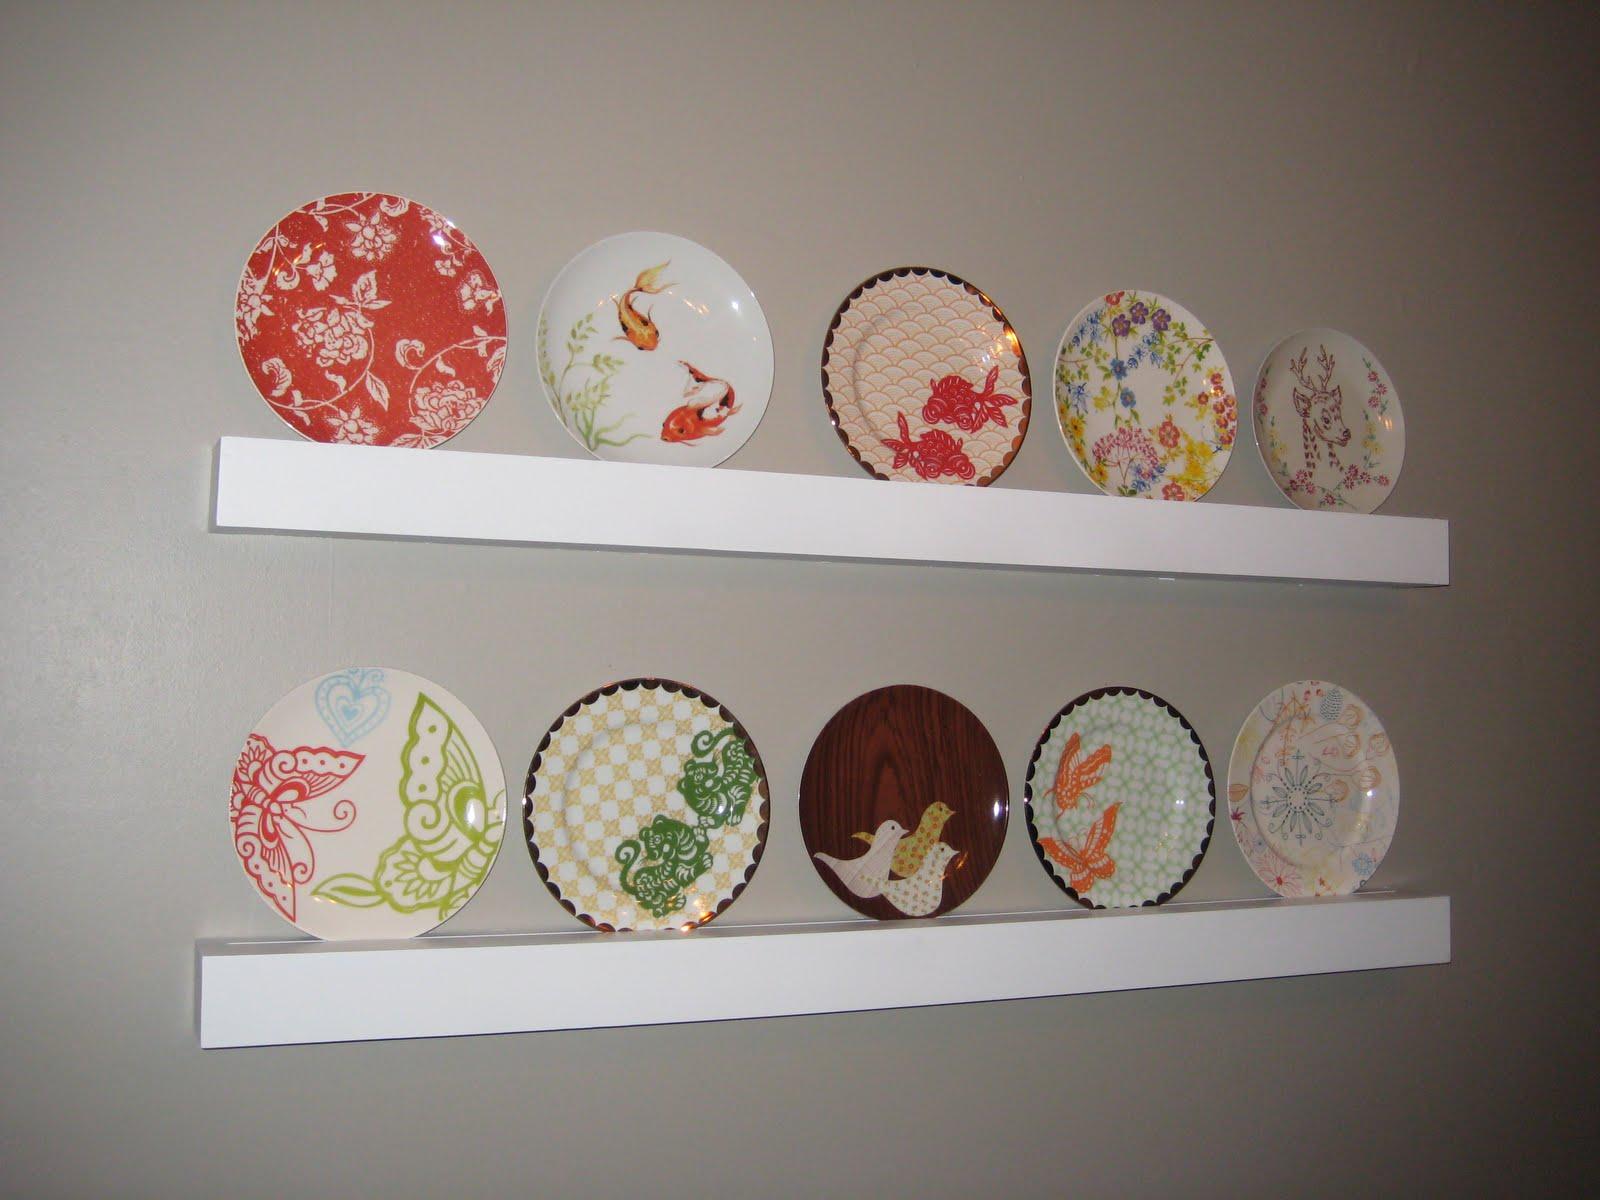 16 Beautiful Plate Shelves For The Wall Sfconfelca Homes